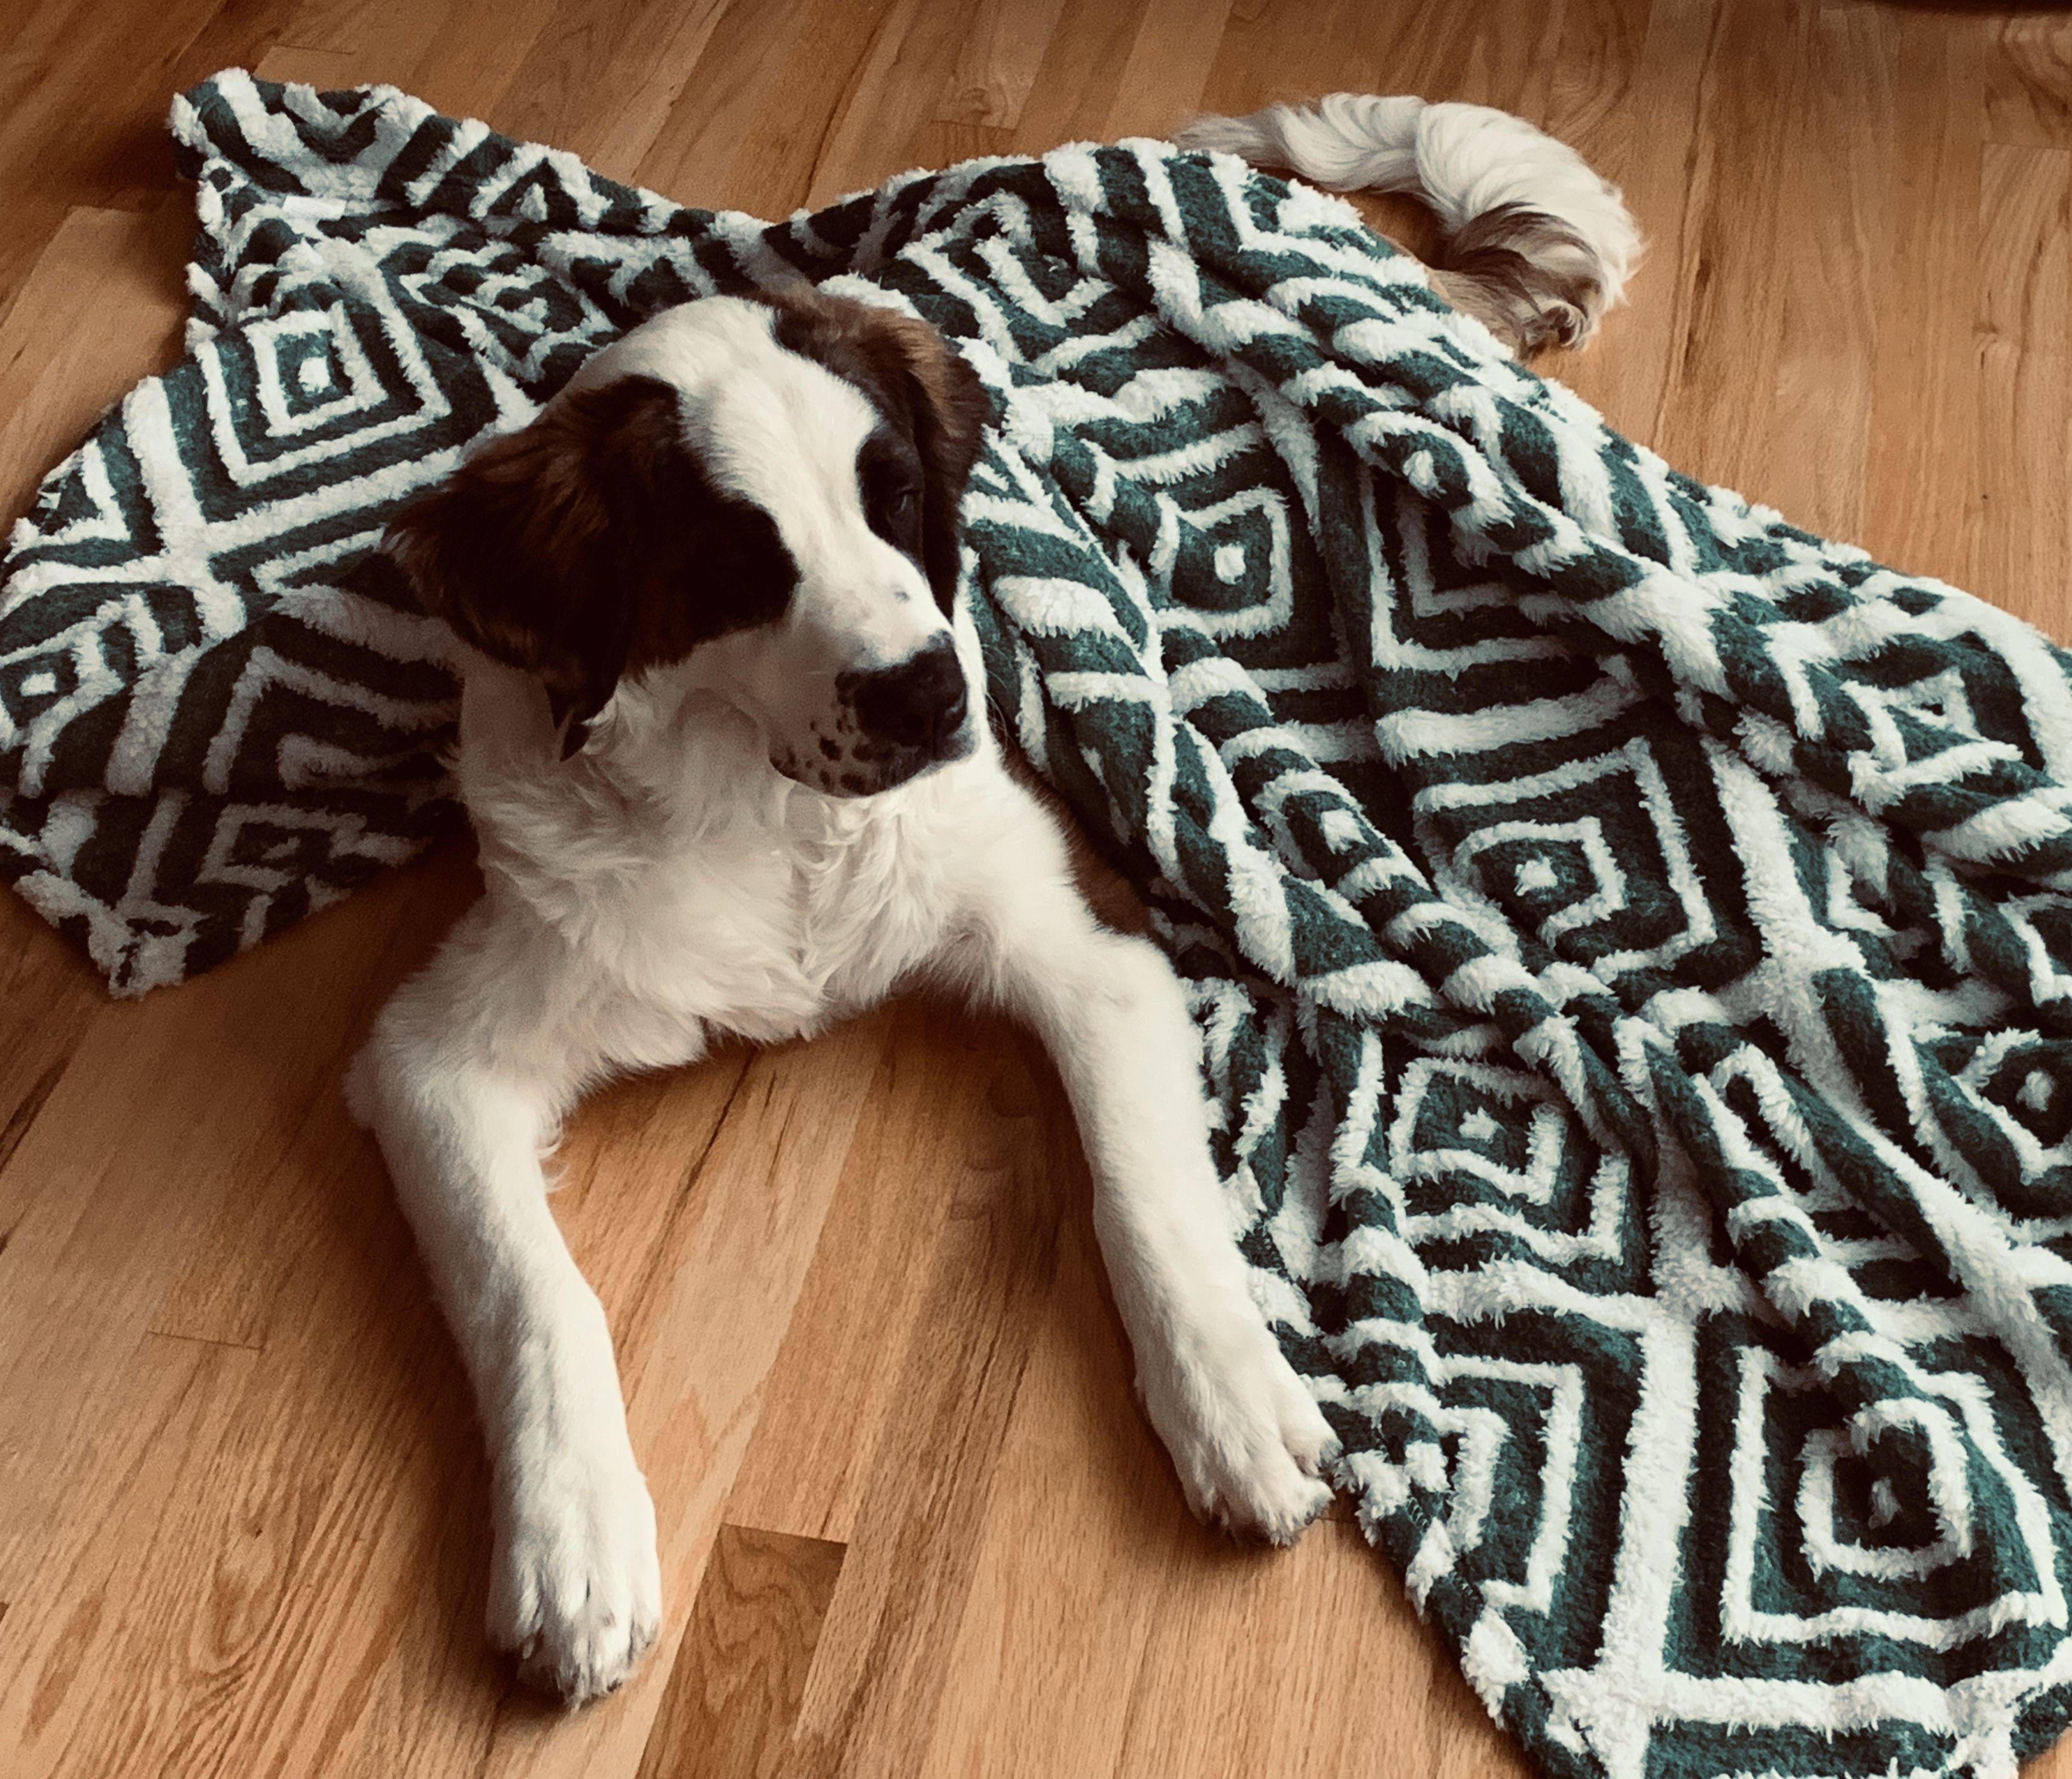 Lucy 8 month old St Bernard Animal print rug, St